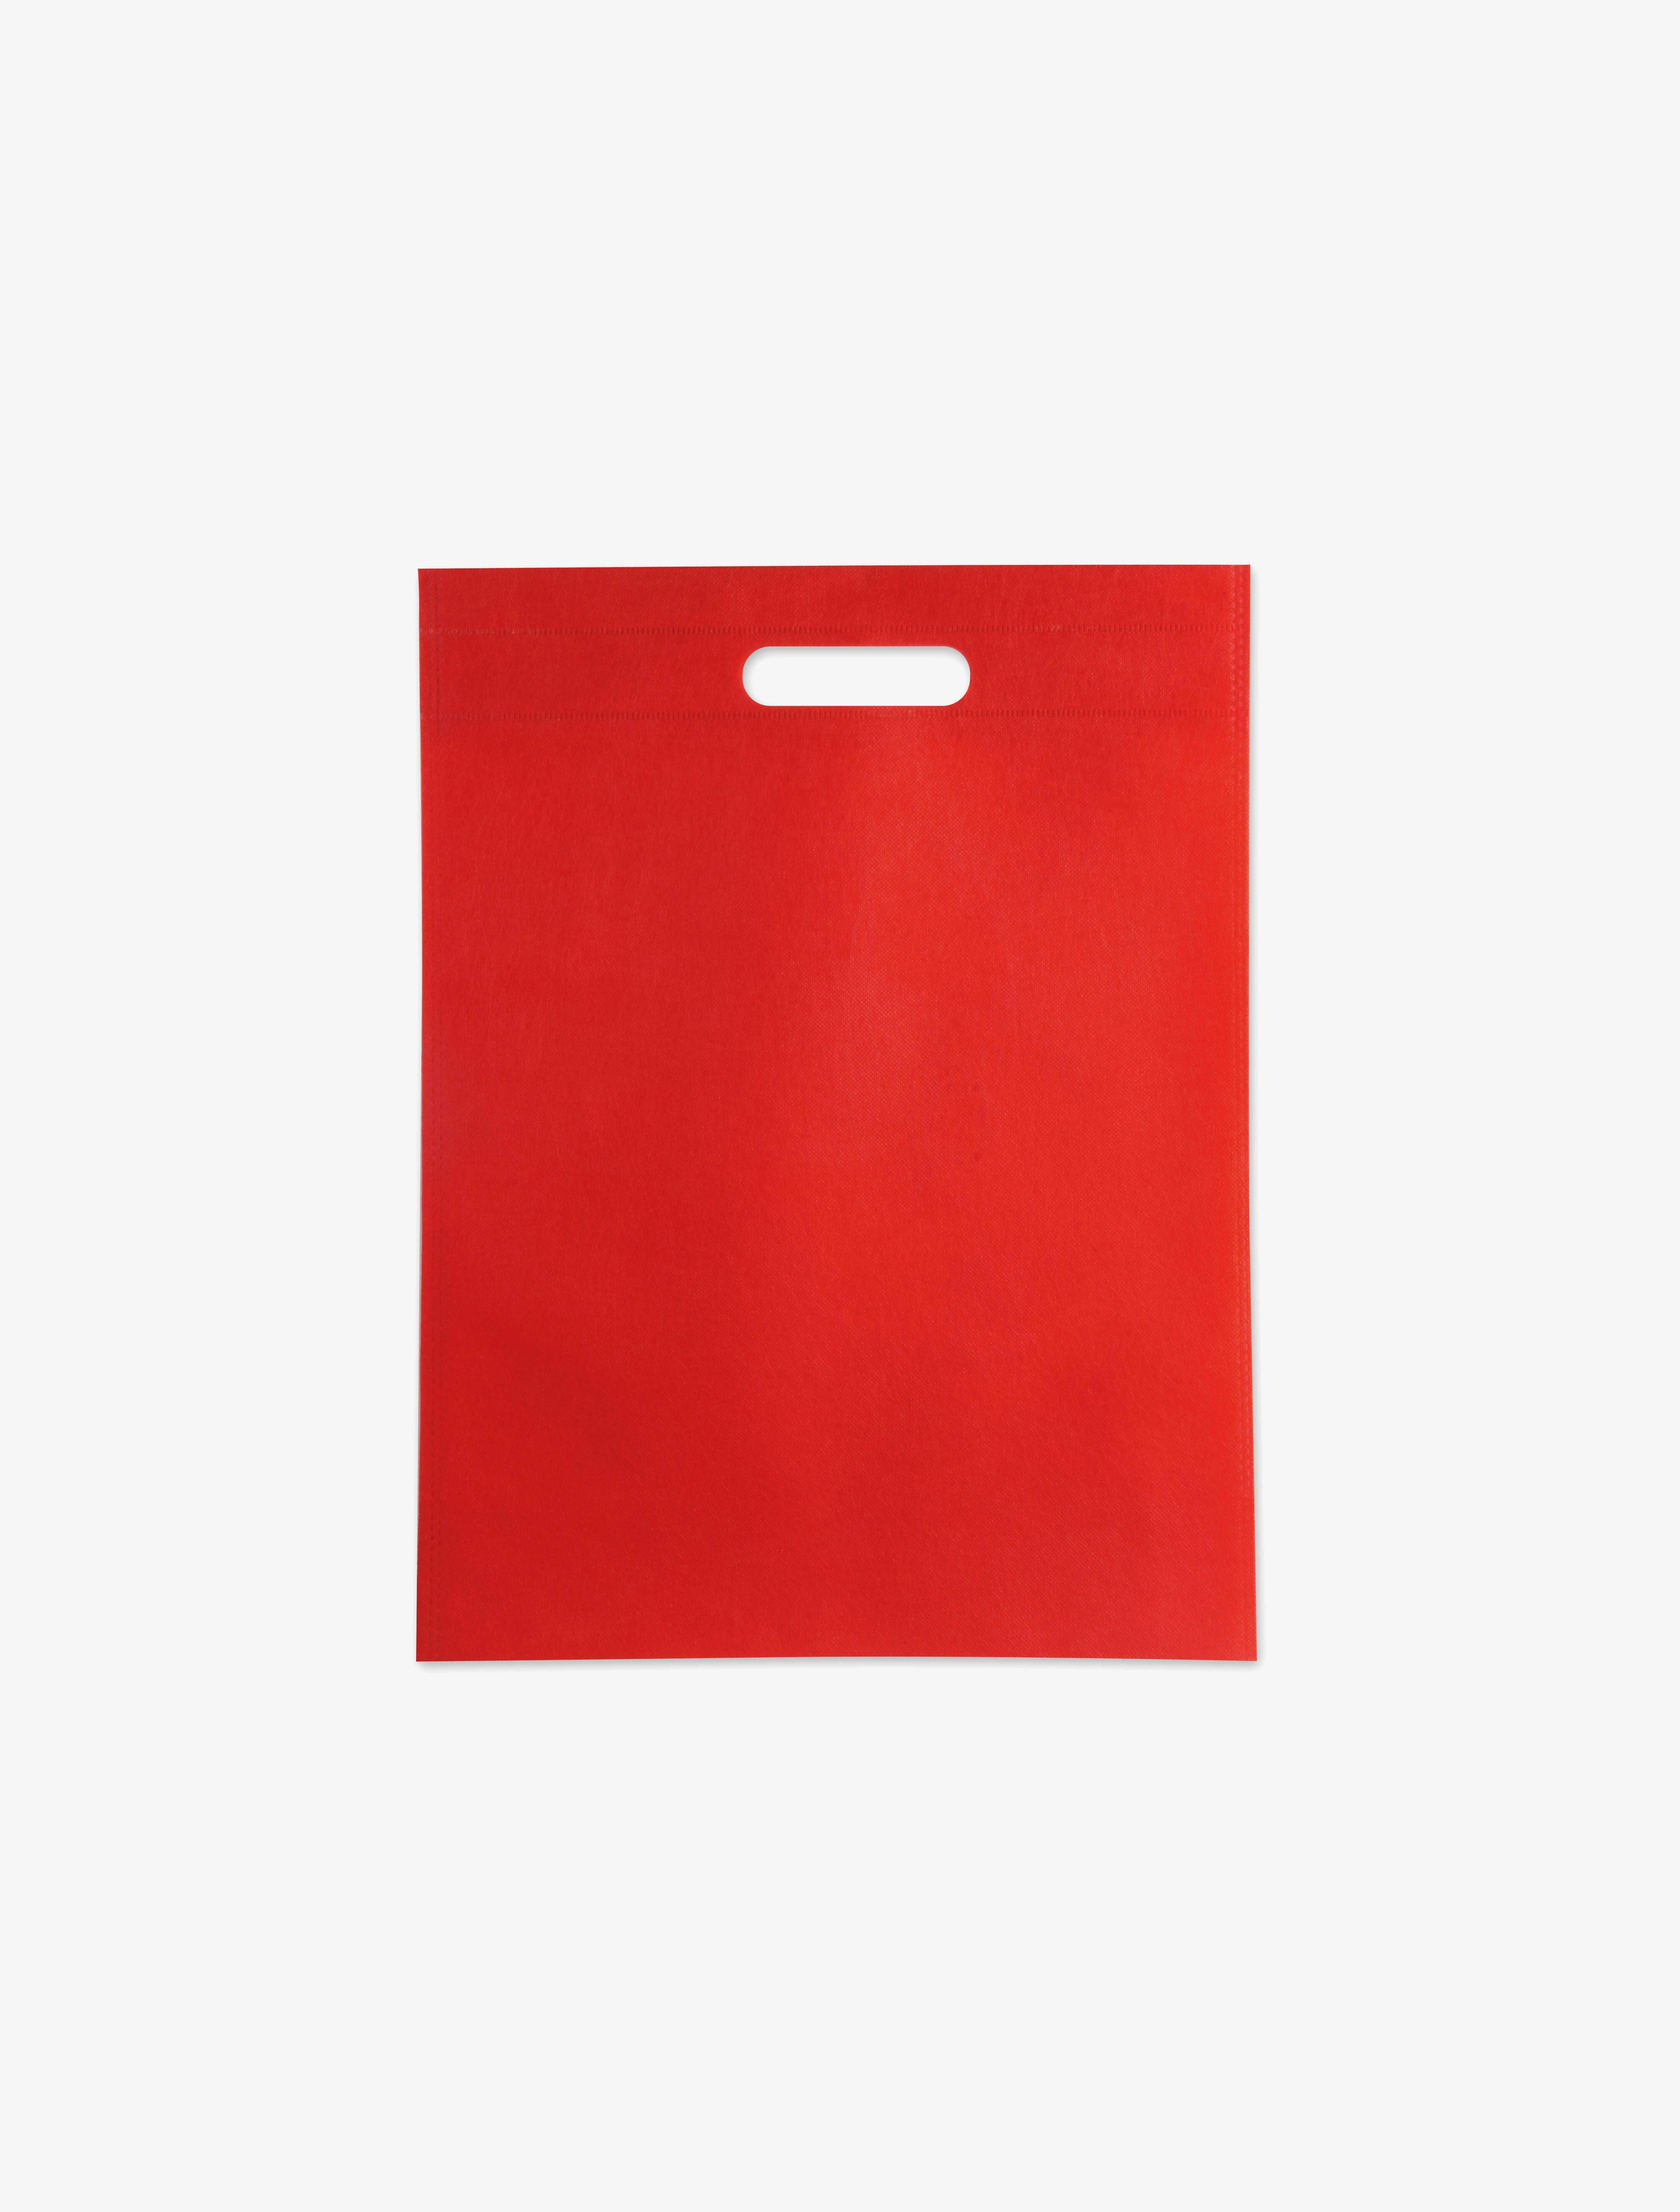 PKD23x35H 红色平口袋 23x35cm